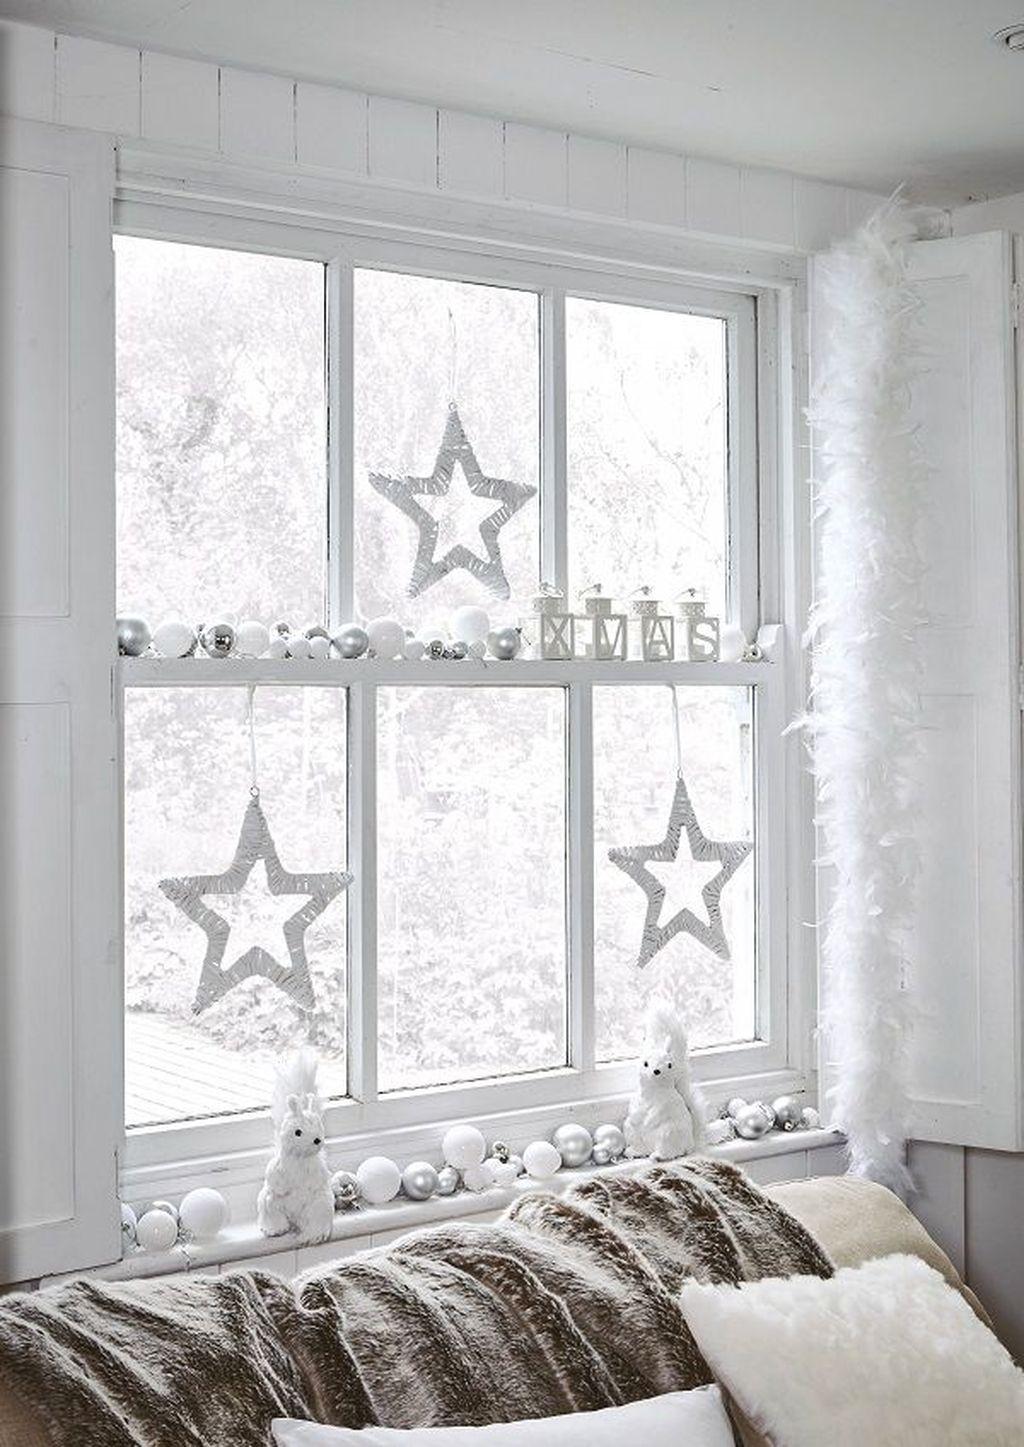 Unordinary Christmas Home Decor Ideas 46